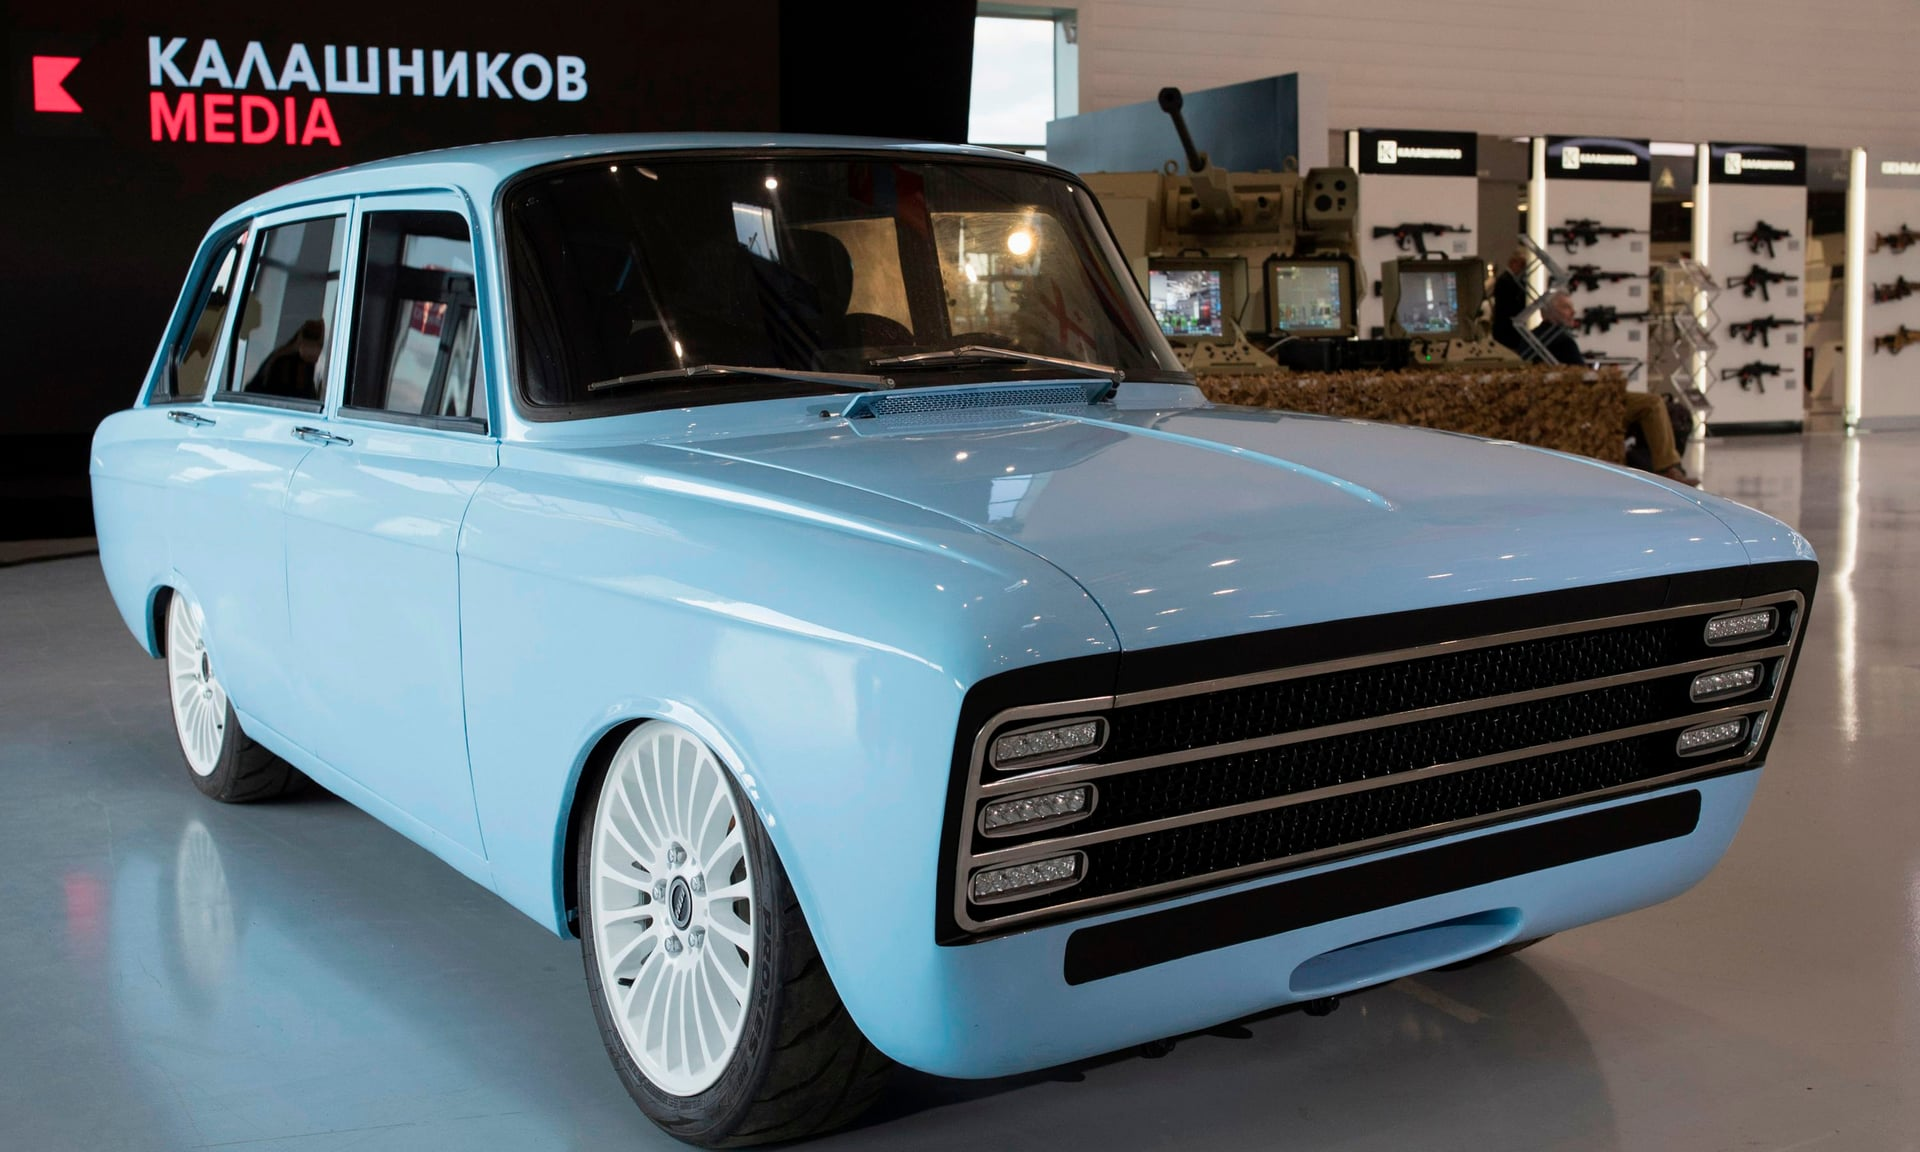 kalashnikov elektrikli otomobil https://huglero.com